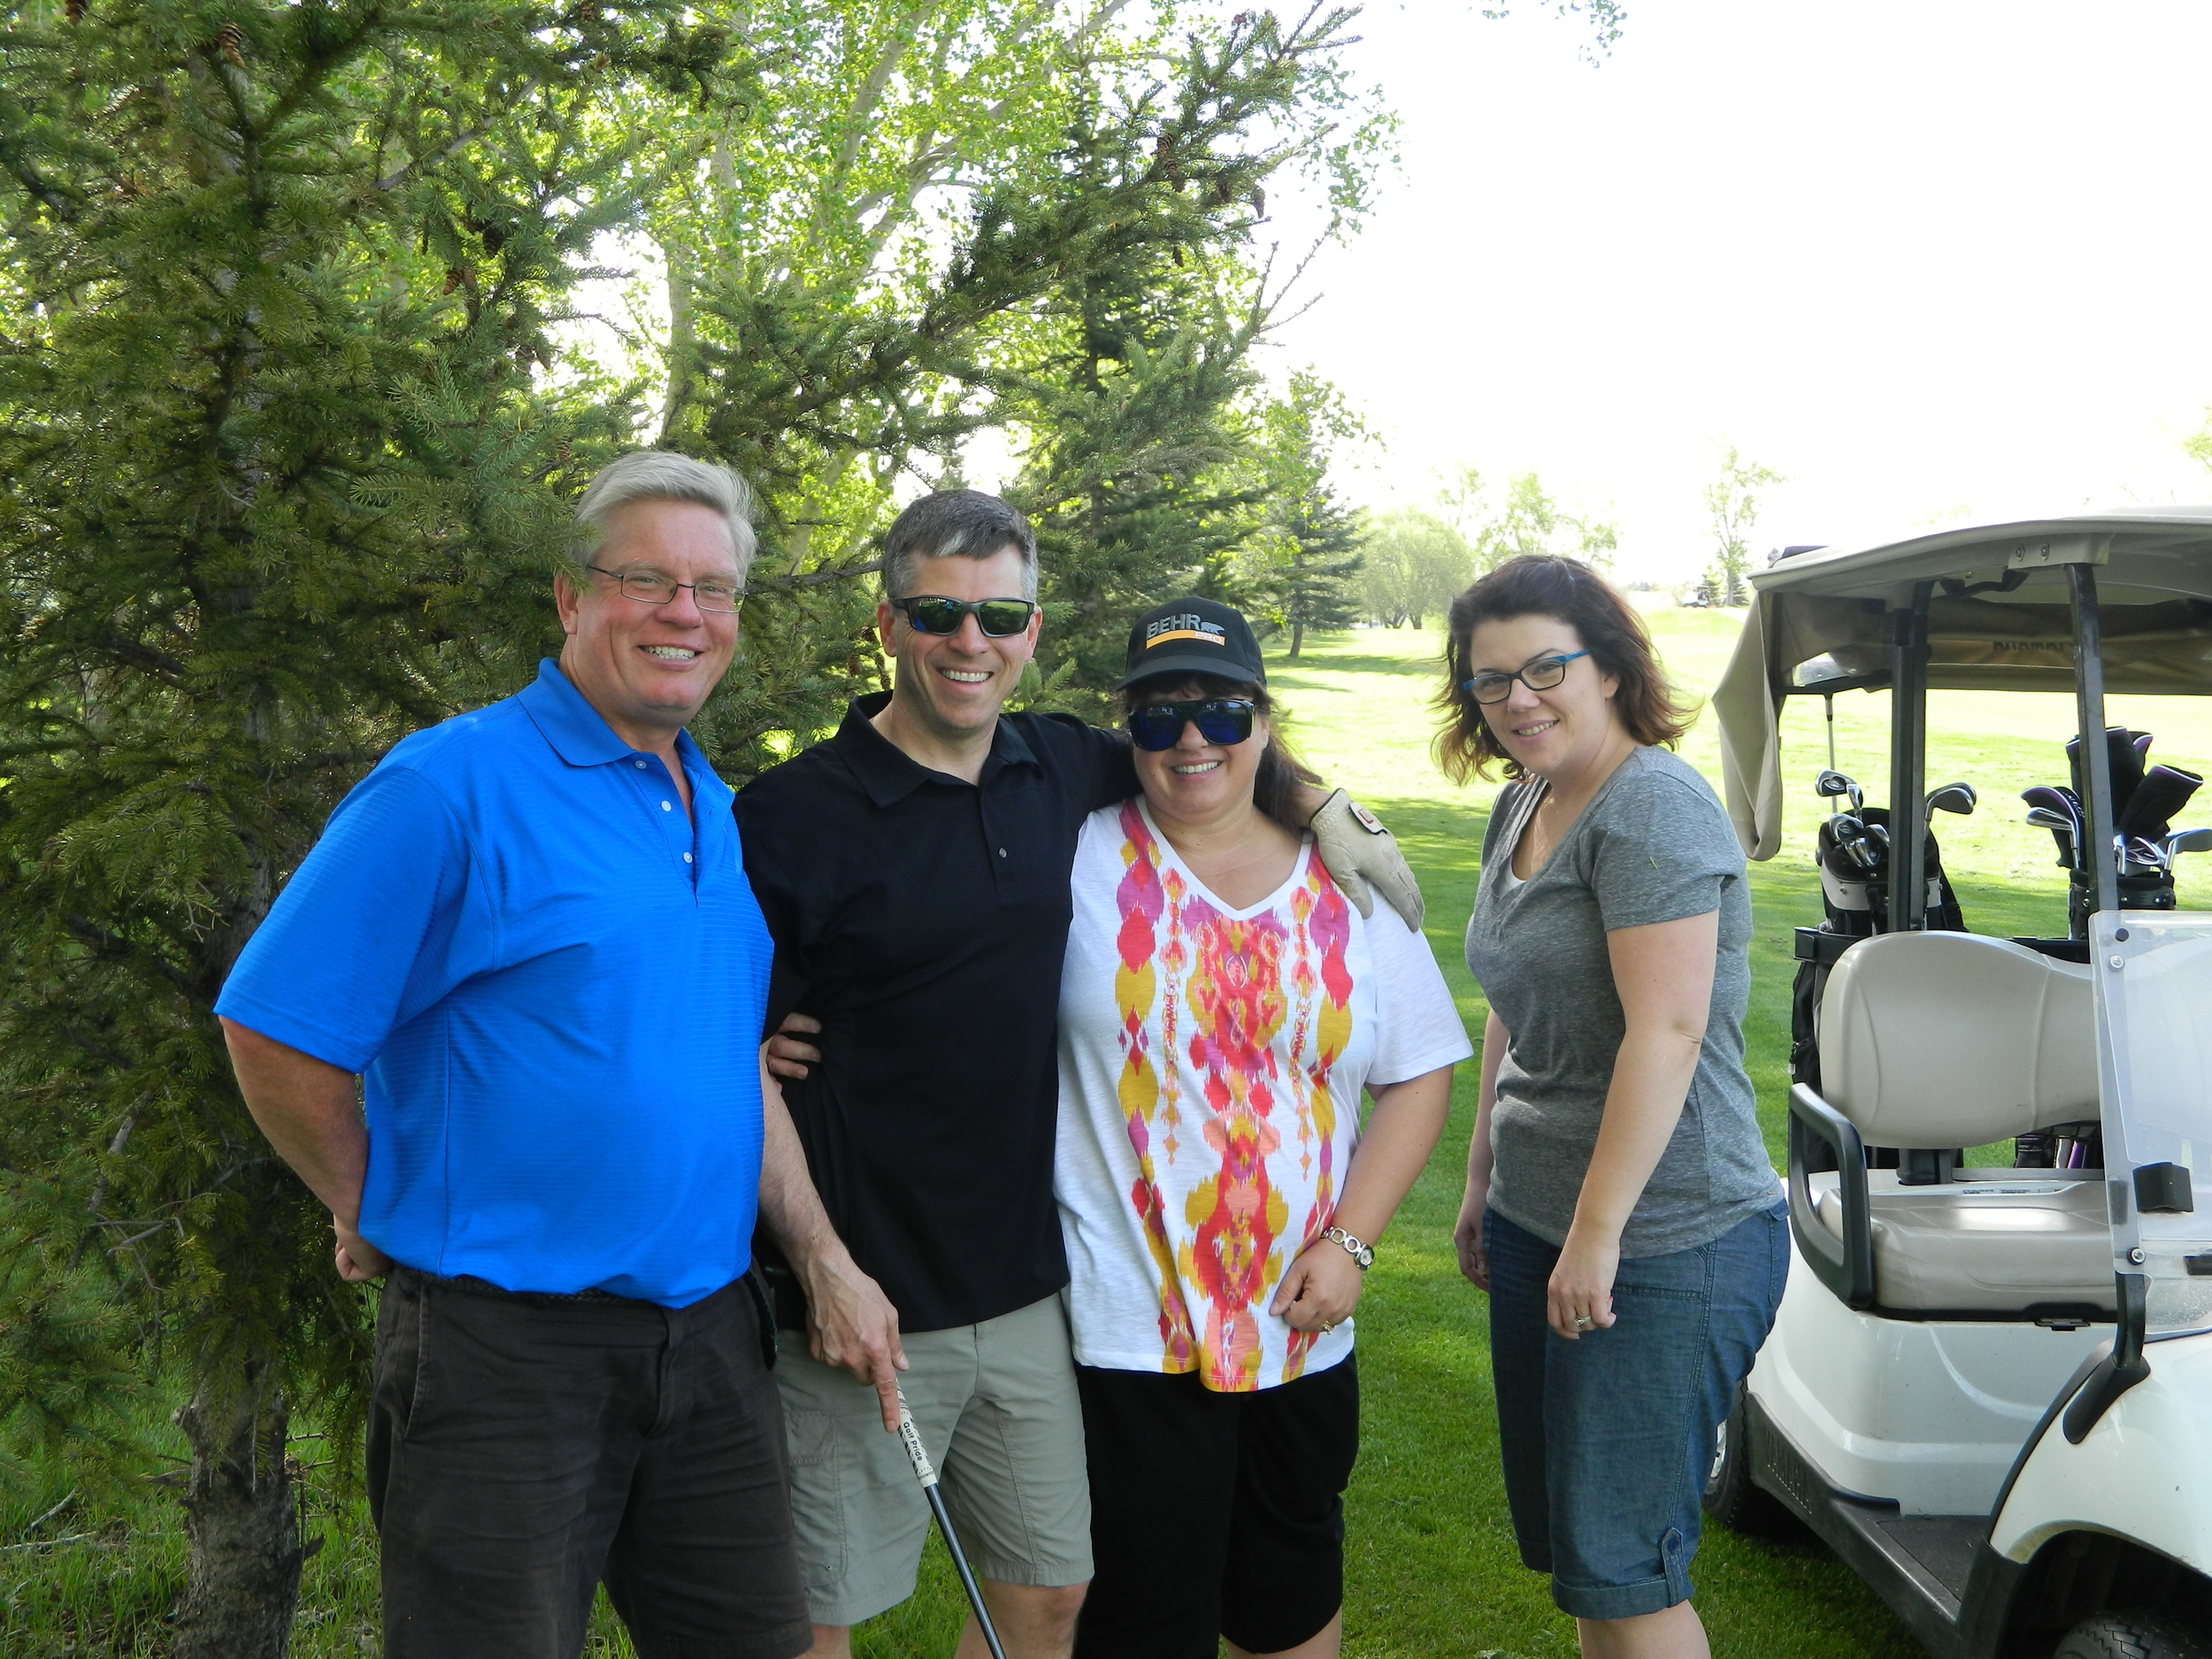 204 golfer pictures 002.jpg